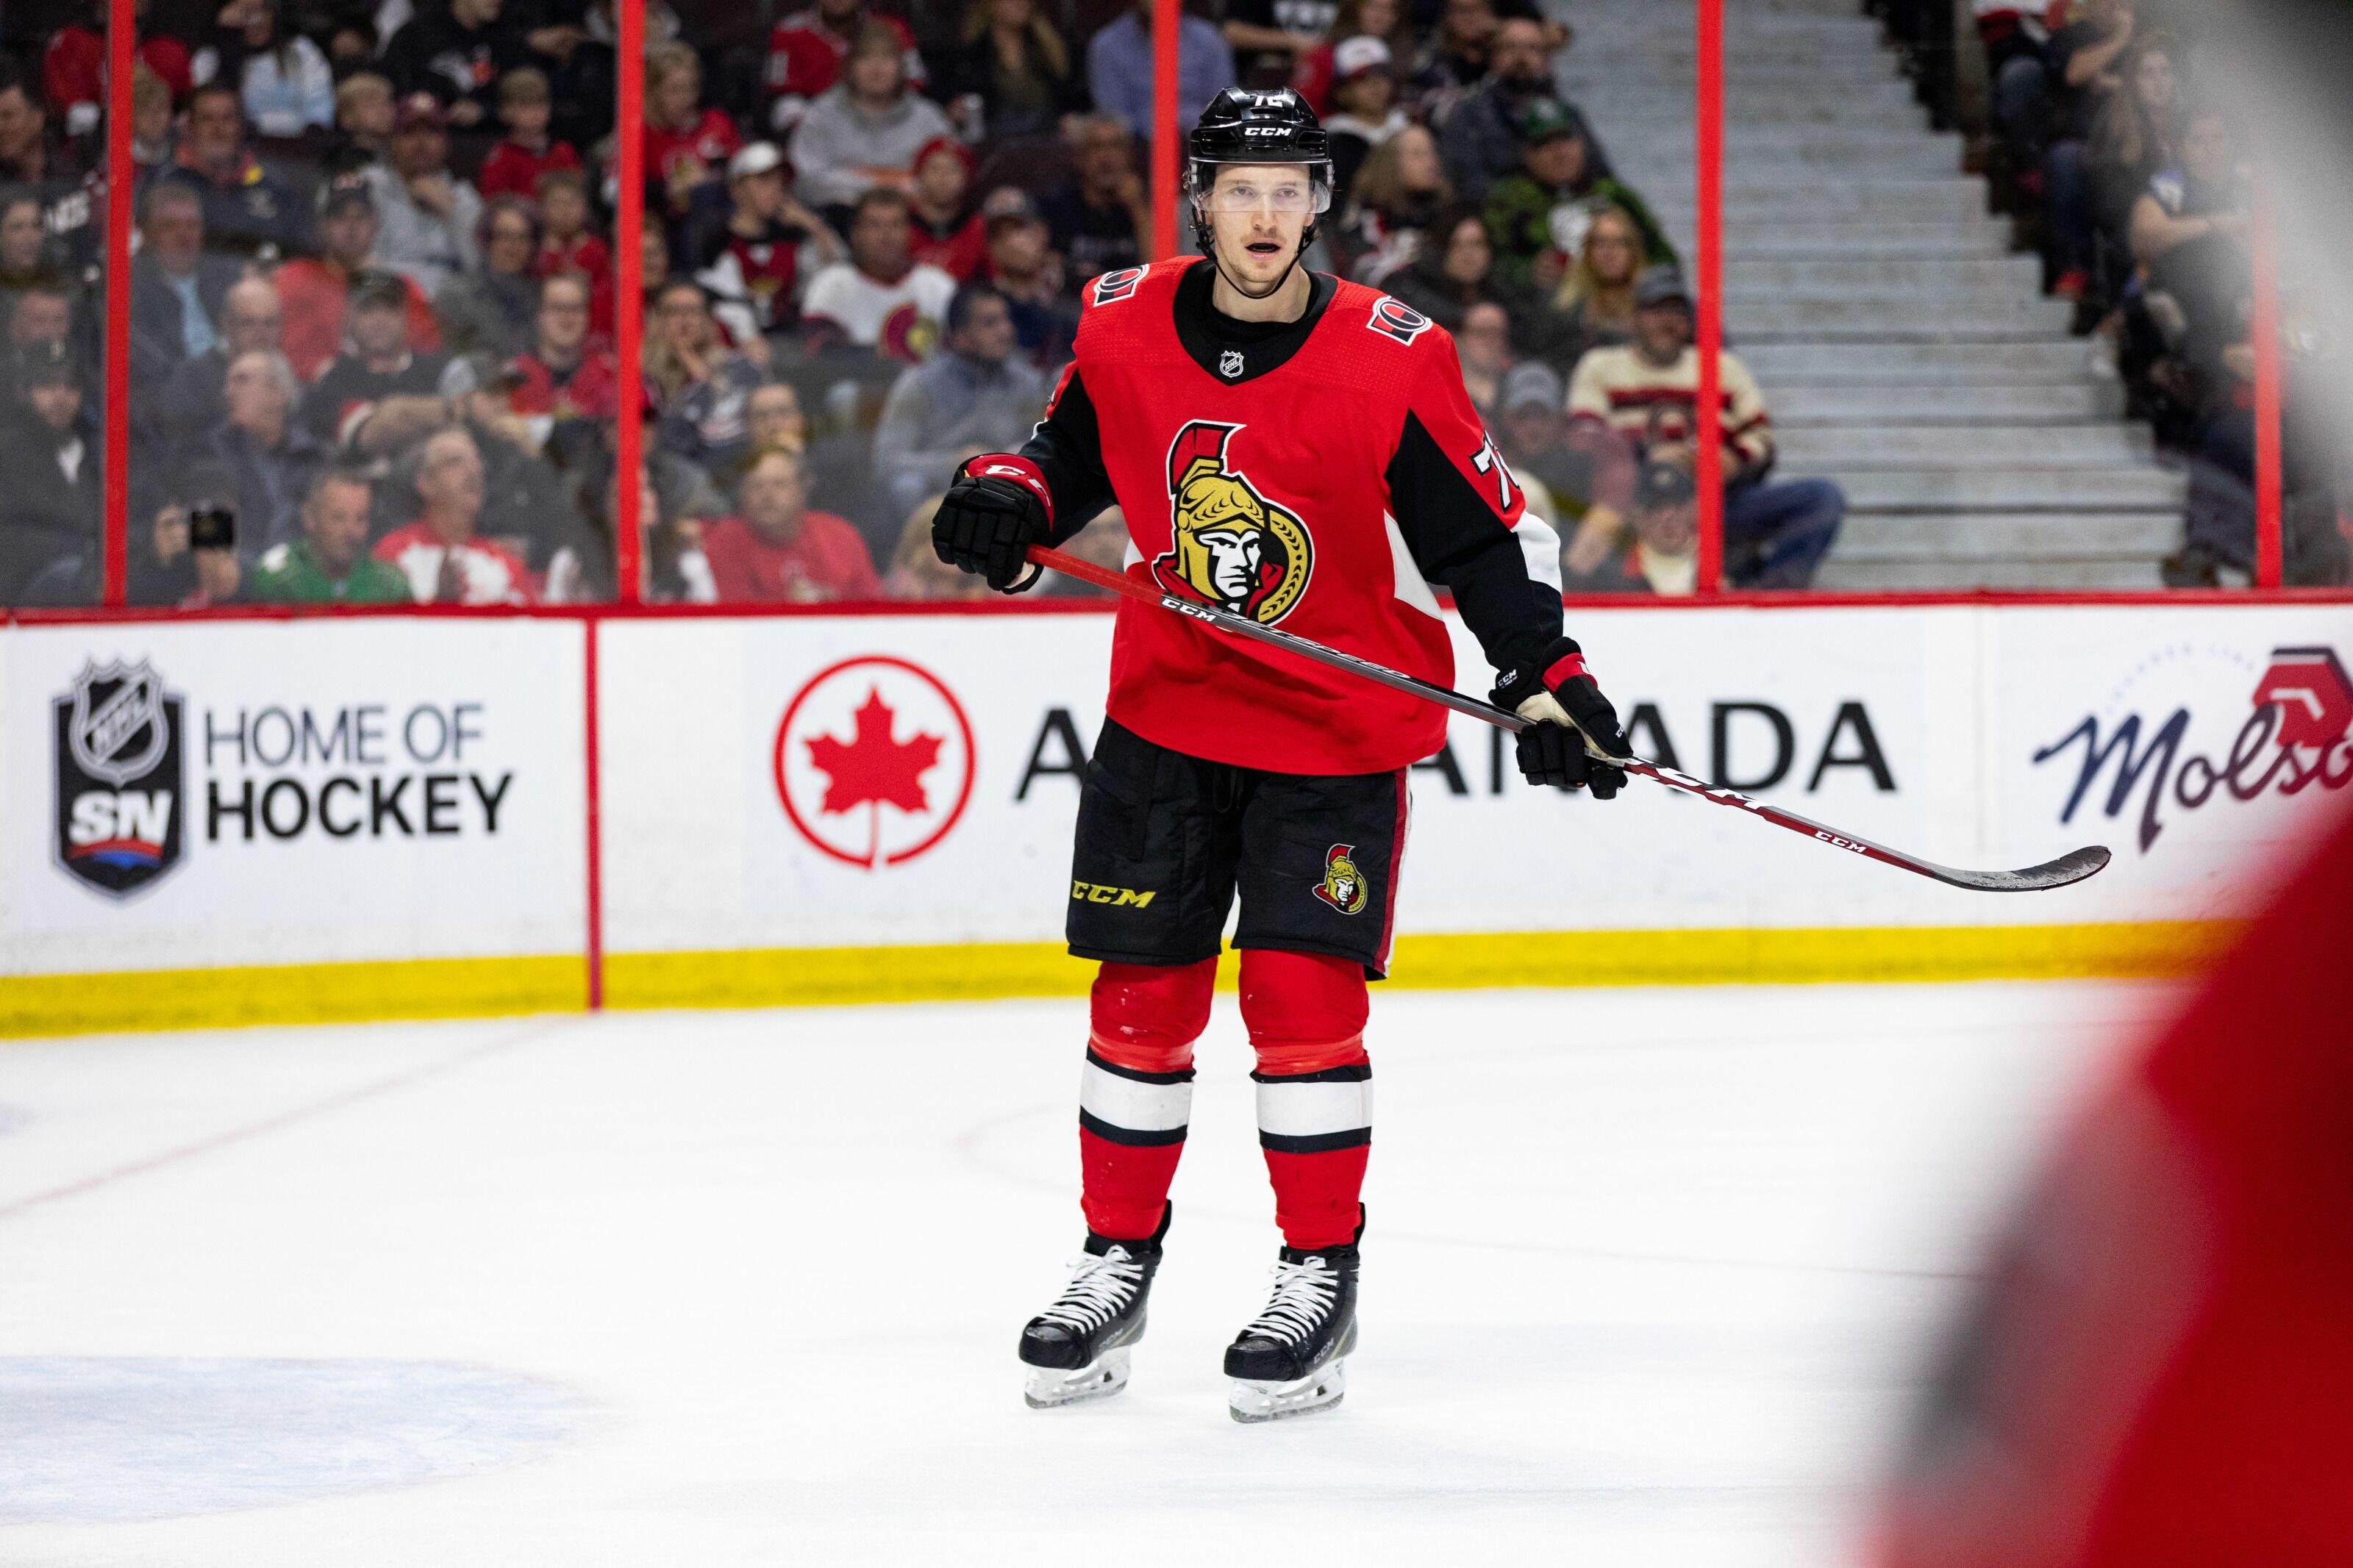 NHL rumors: Ottawa Senators working on extension with Thomas Chabot